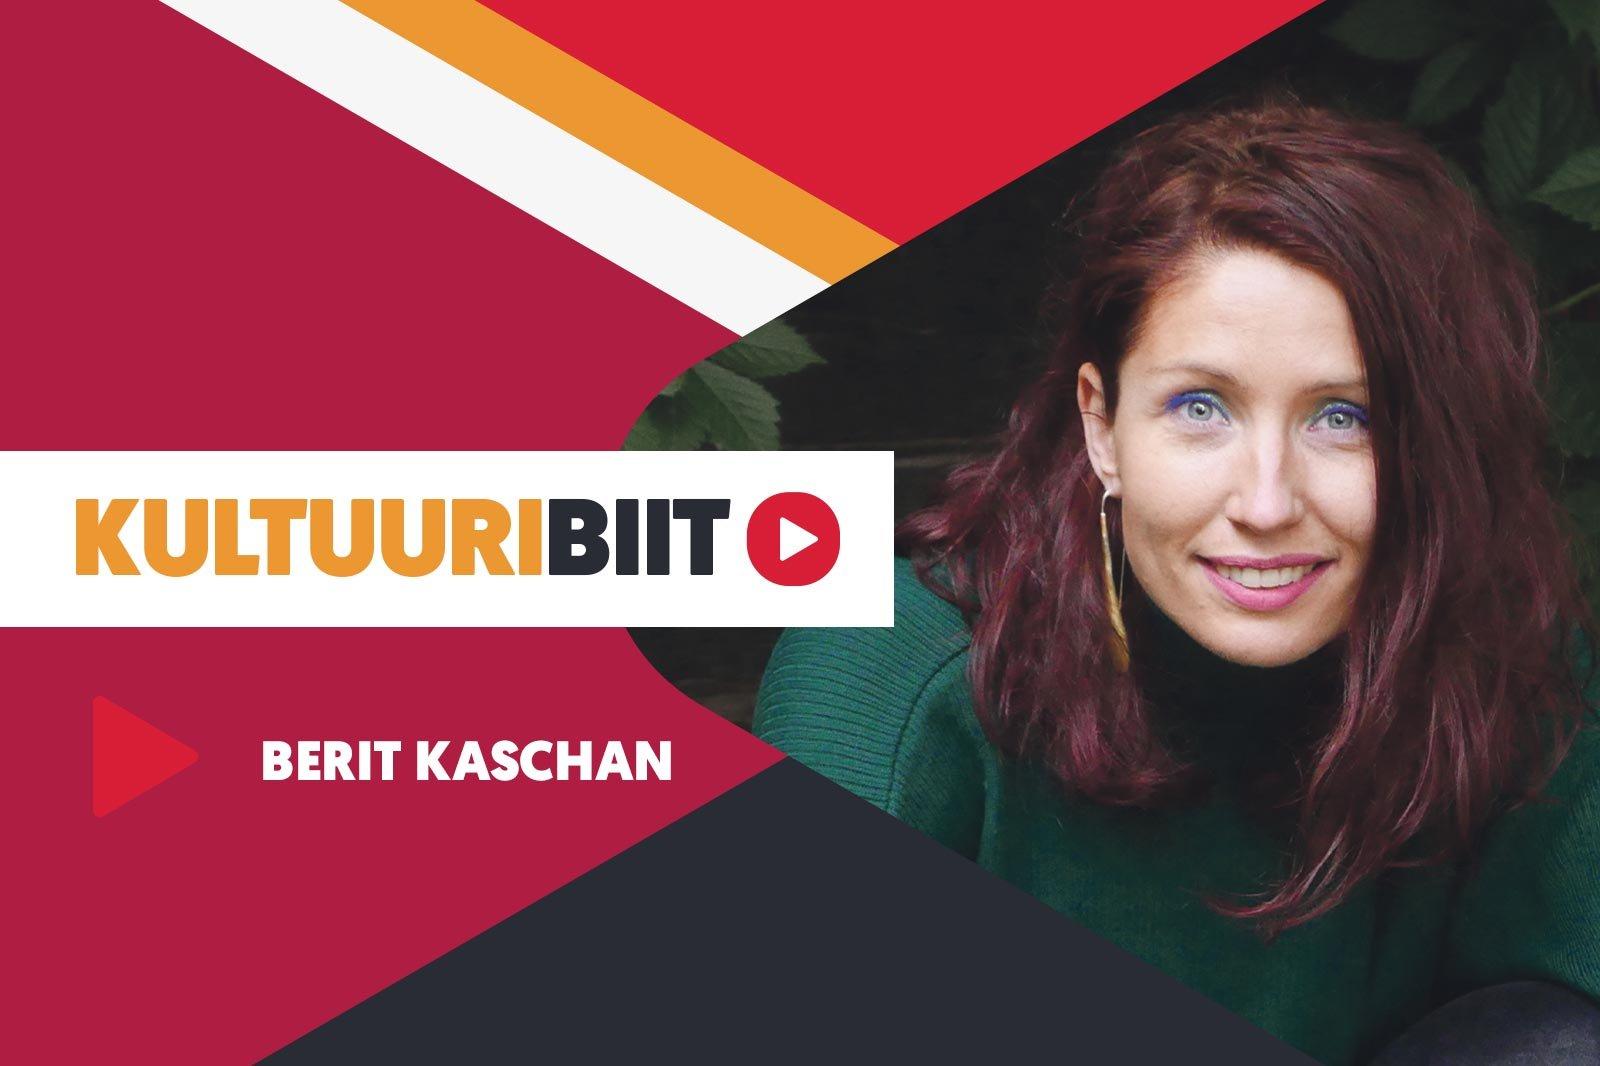 KULTUURIBIIT | Luuletaja Berit Kaschani playlist: